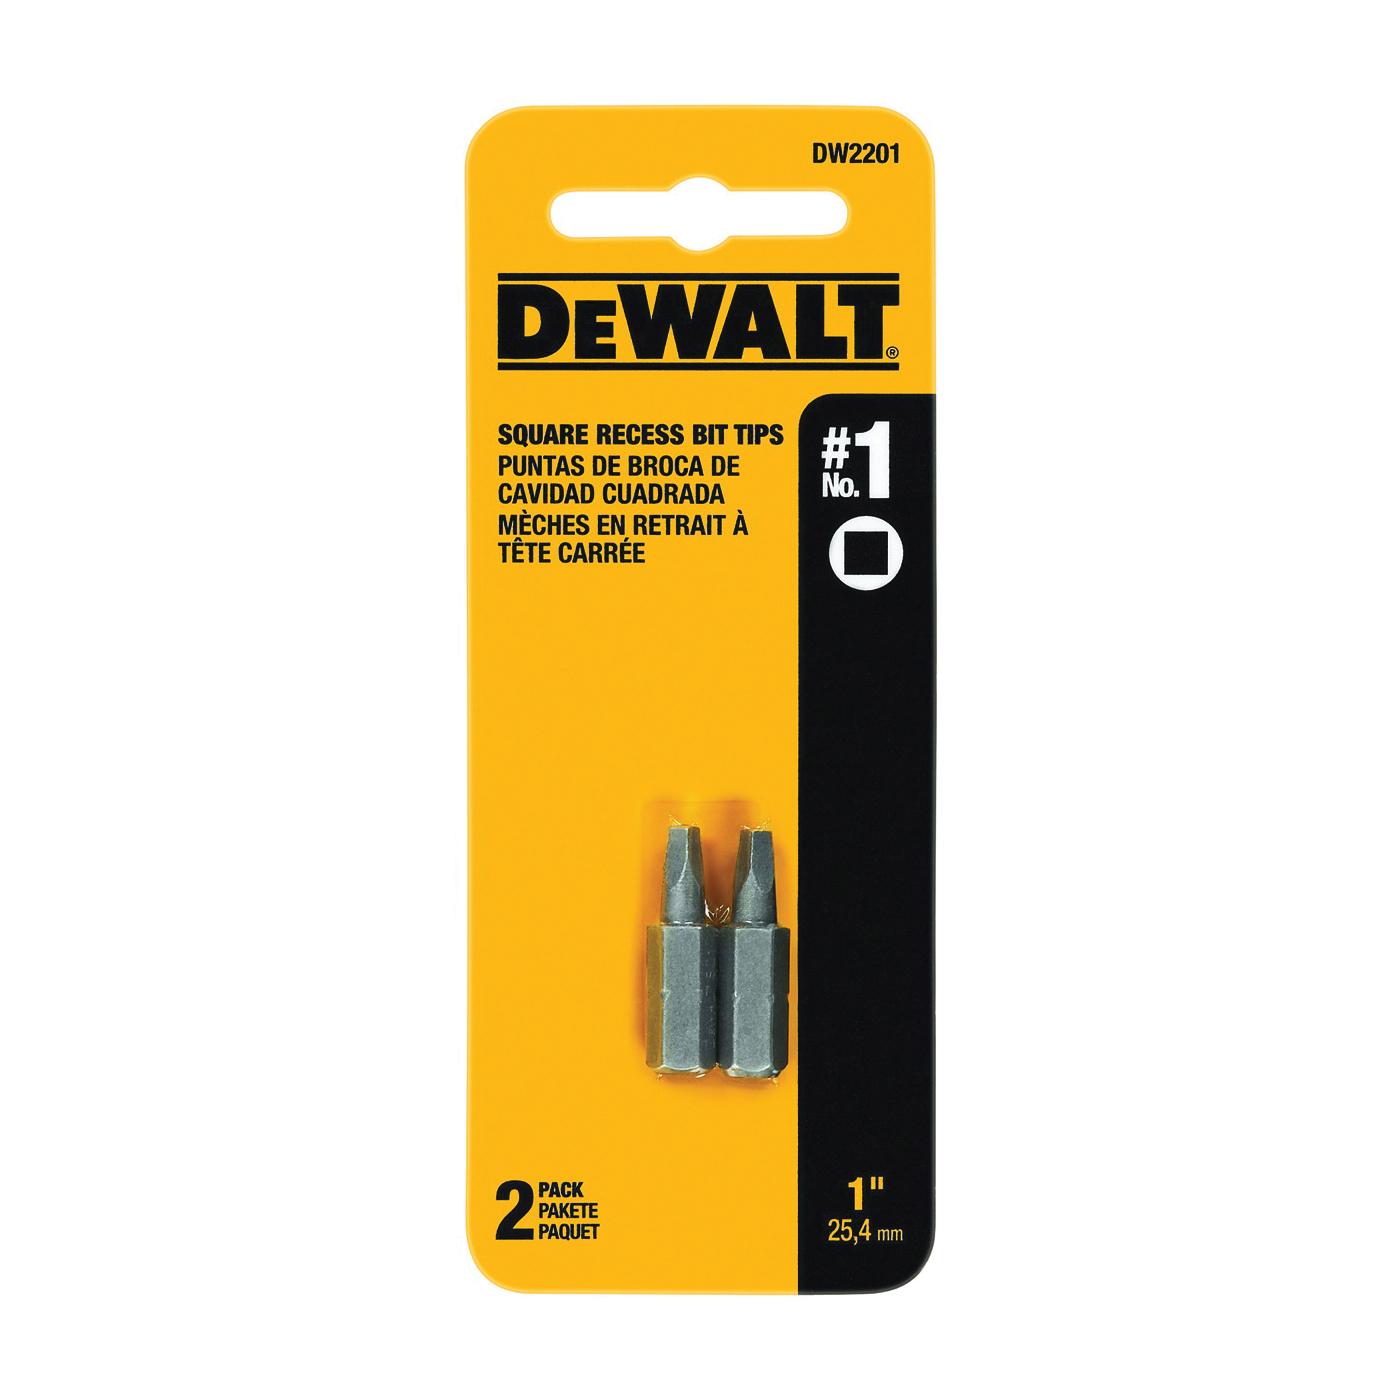 Picture of DeWALT DW2201 Screwdriver Bit, #1 Drive, Square Recess Drive, 1/4 in Shank, Hex Shank, 1 in L, Steel